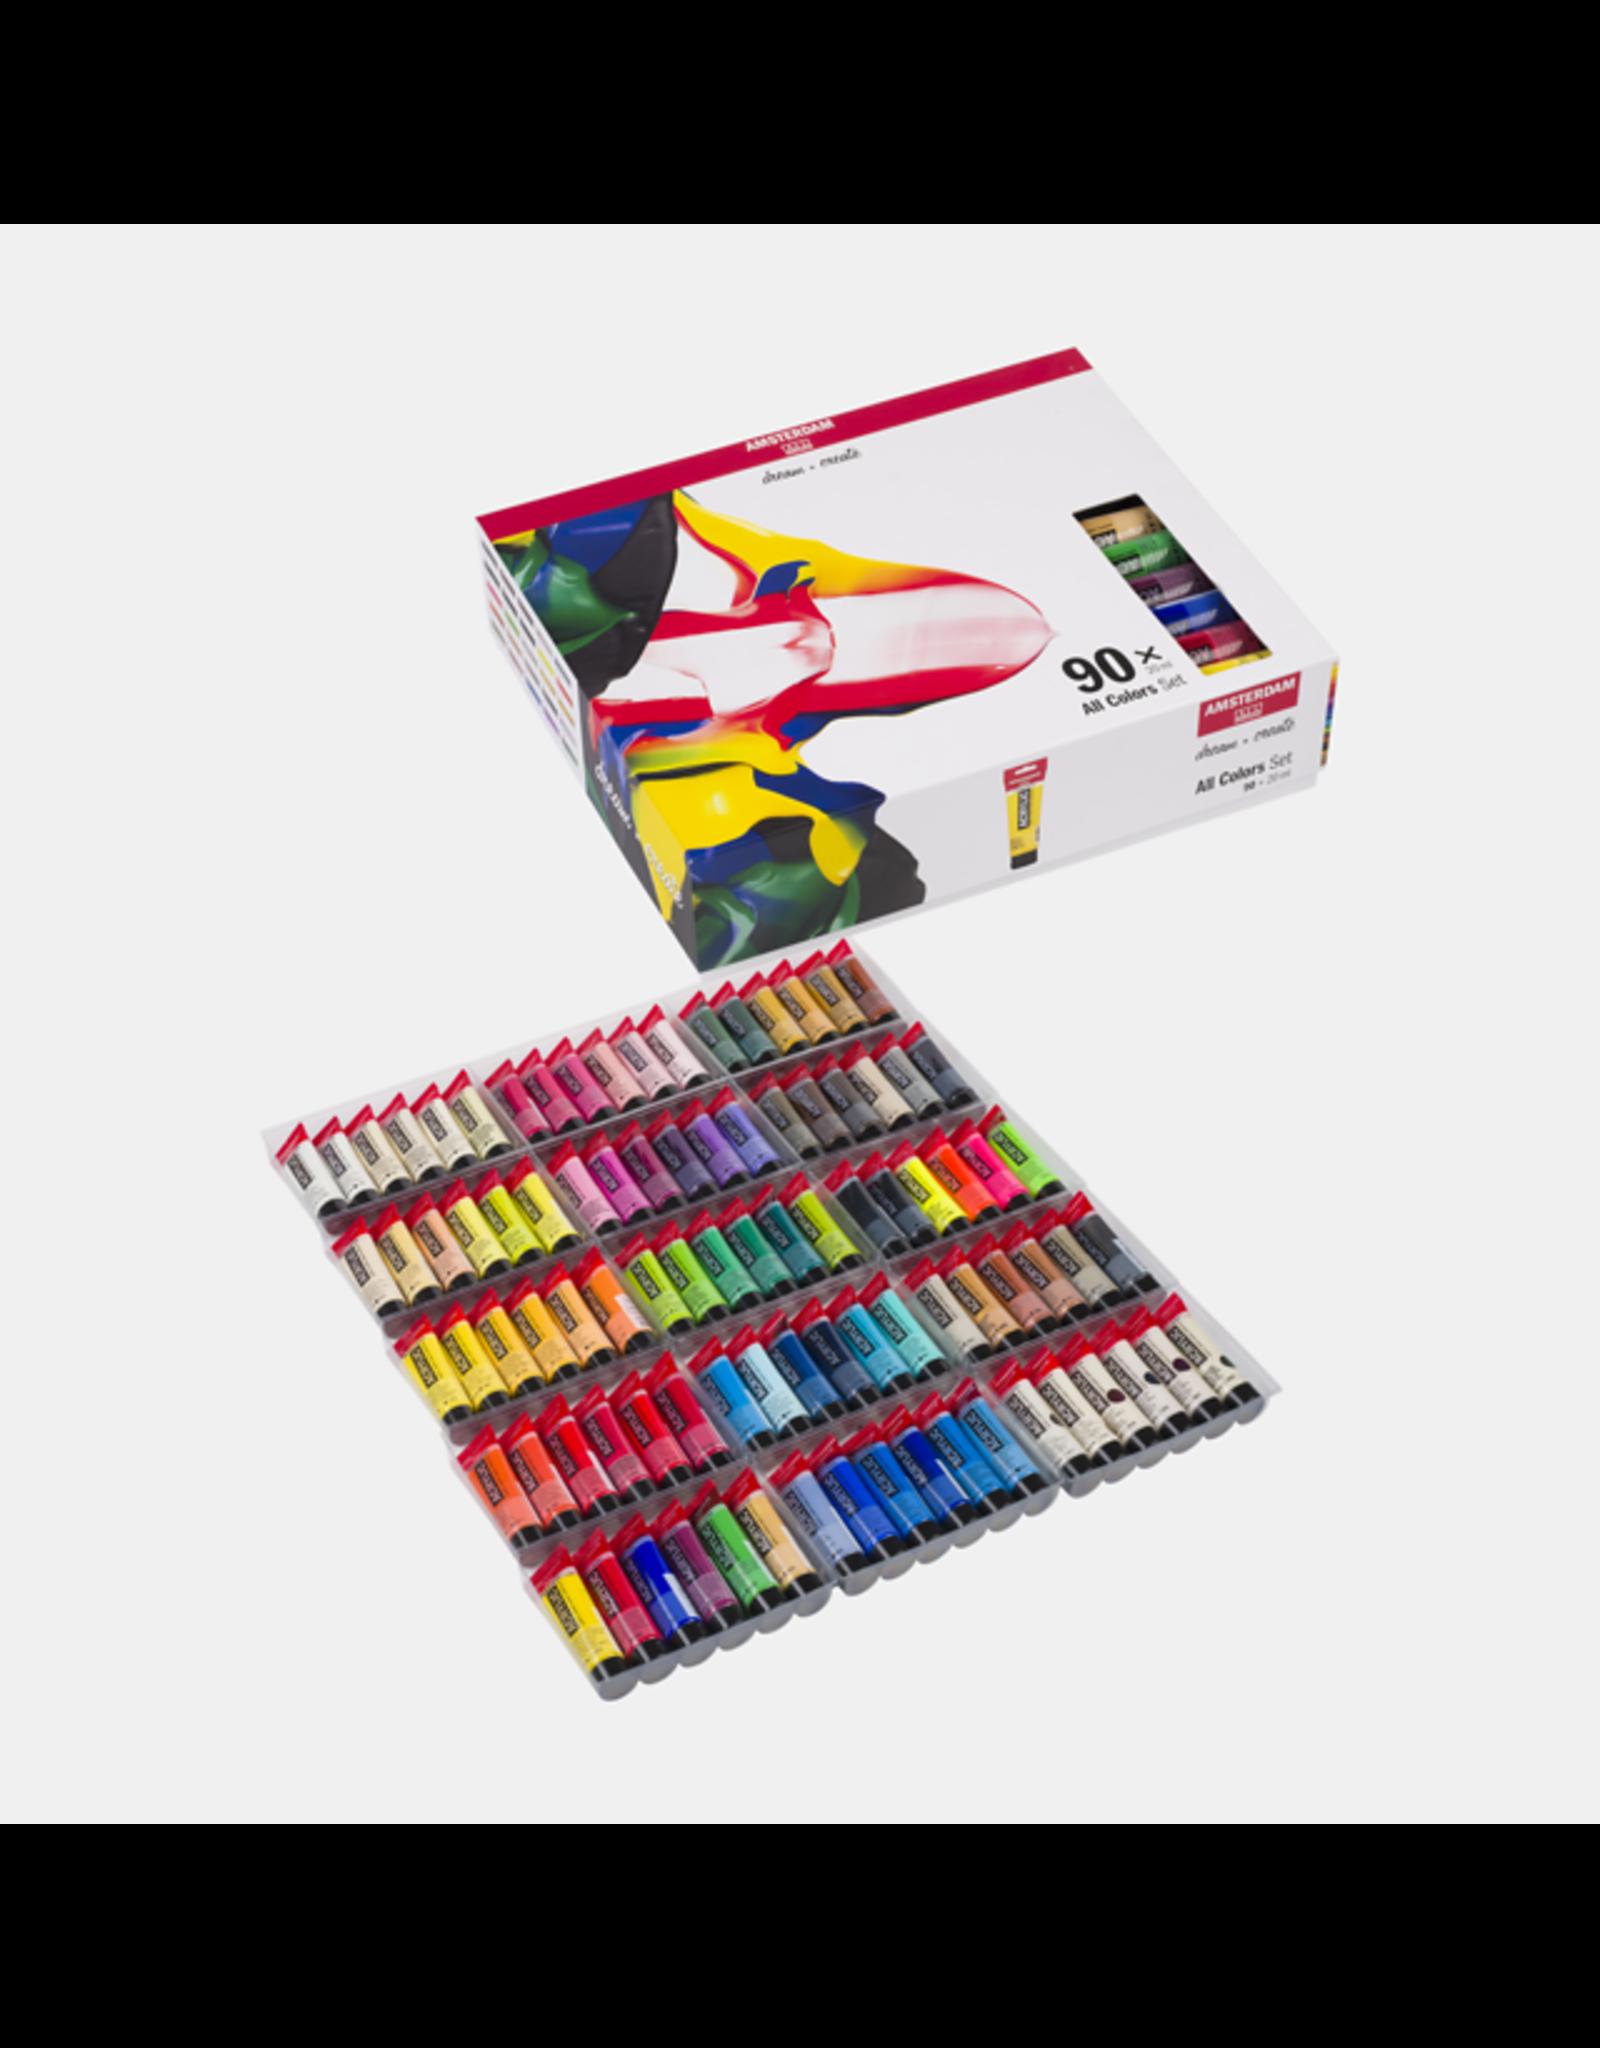 Amsterdam Alle kleuren set 90x20ml